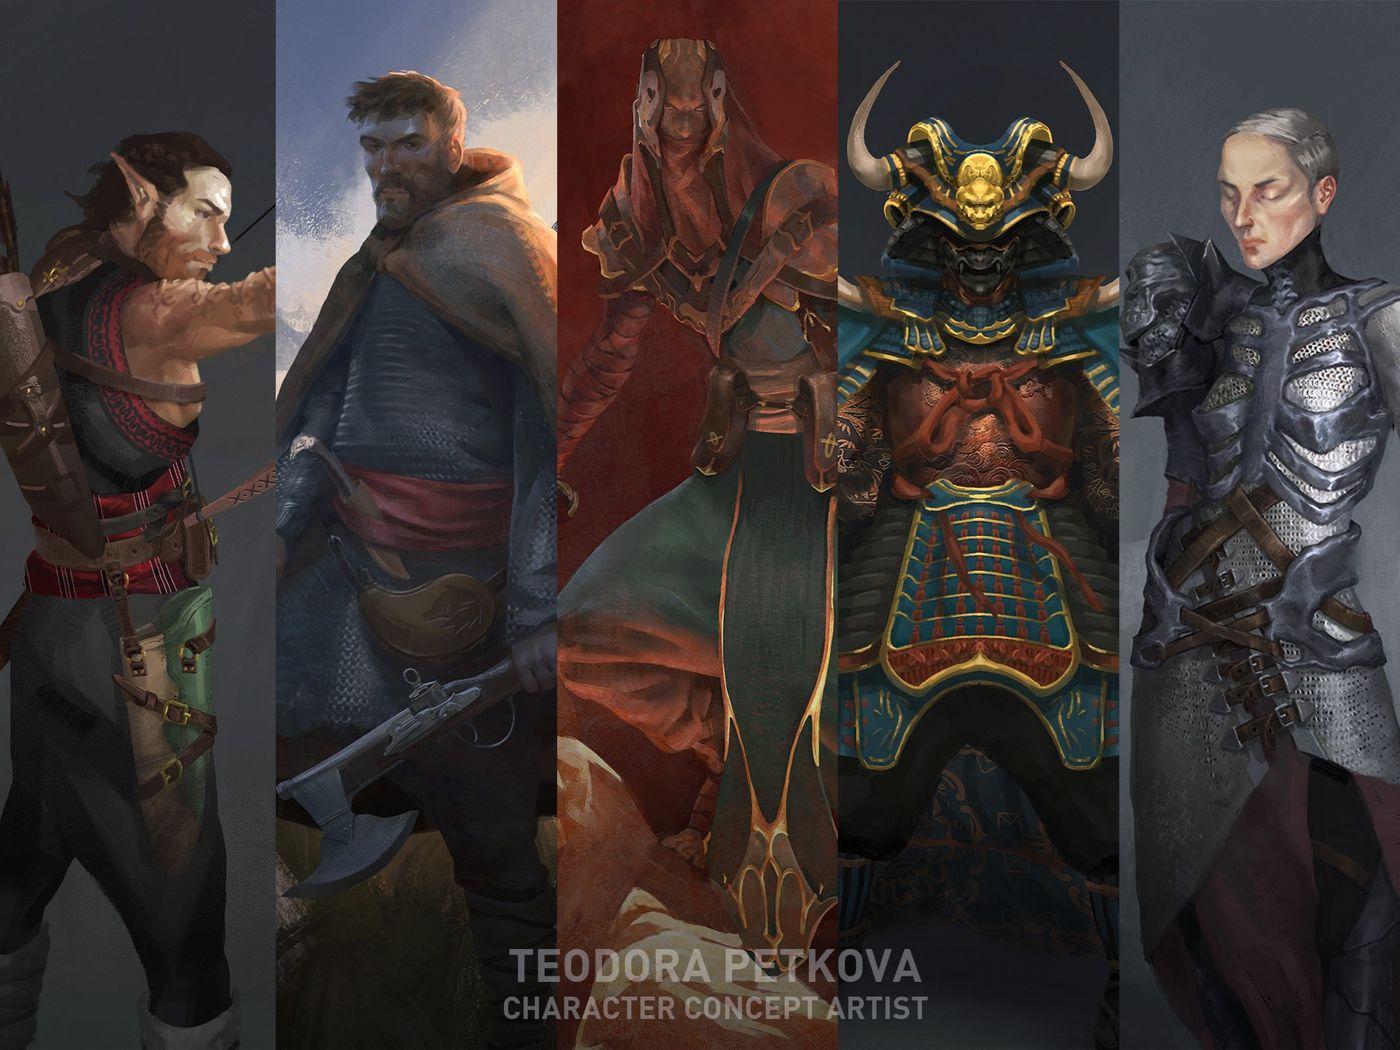 Teodora Petkova - Character Concept Art And Illustration